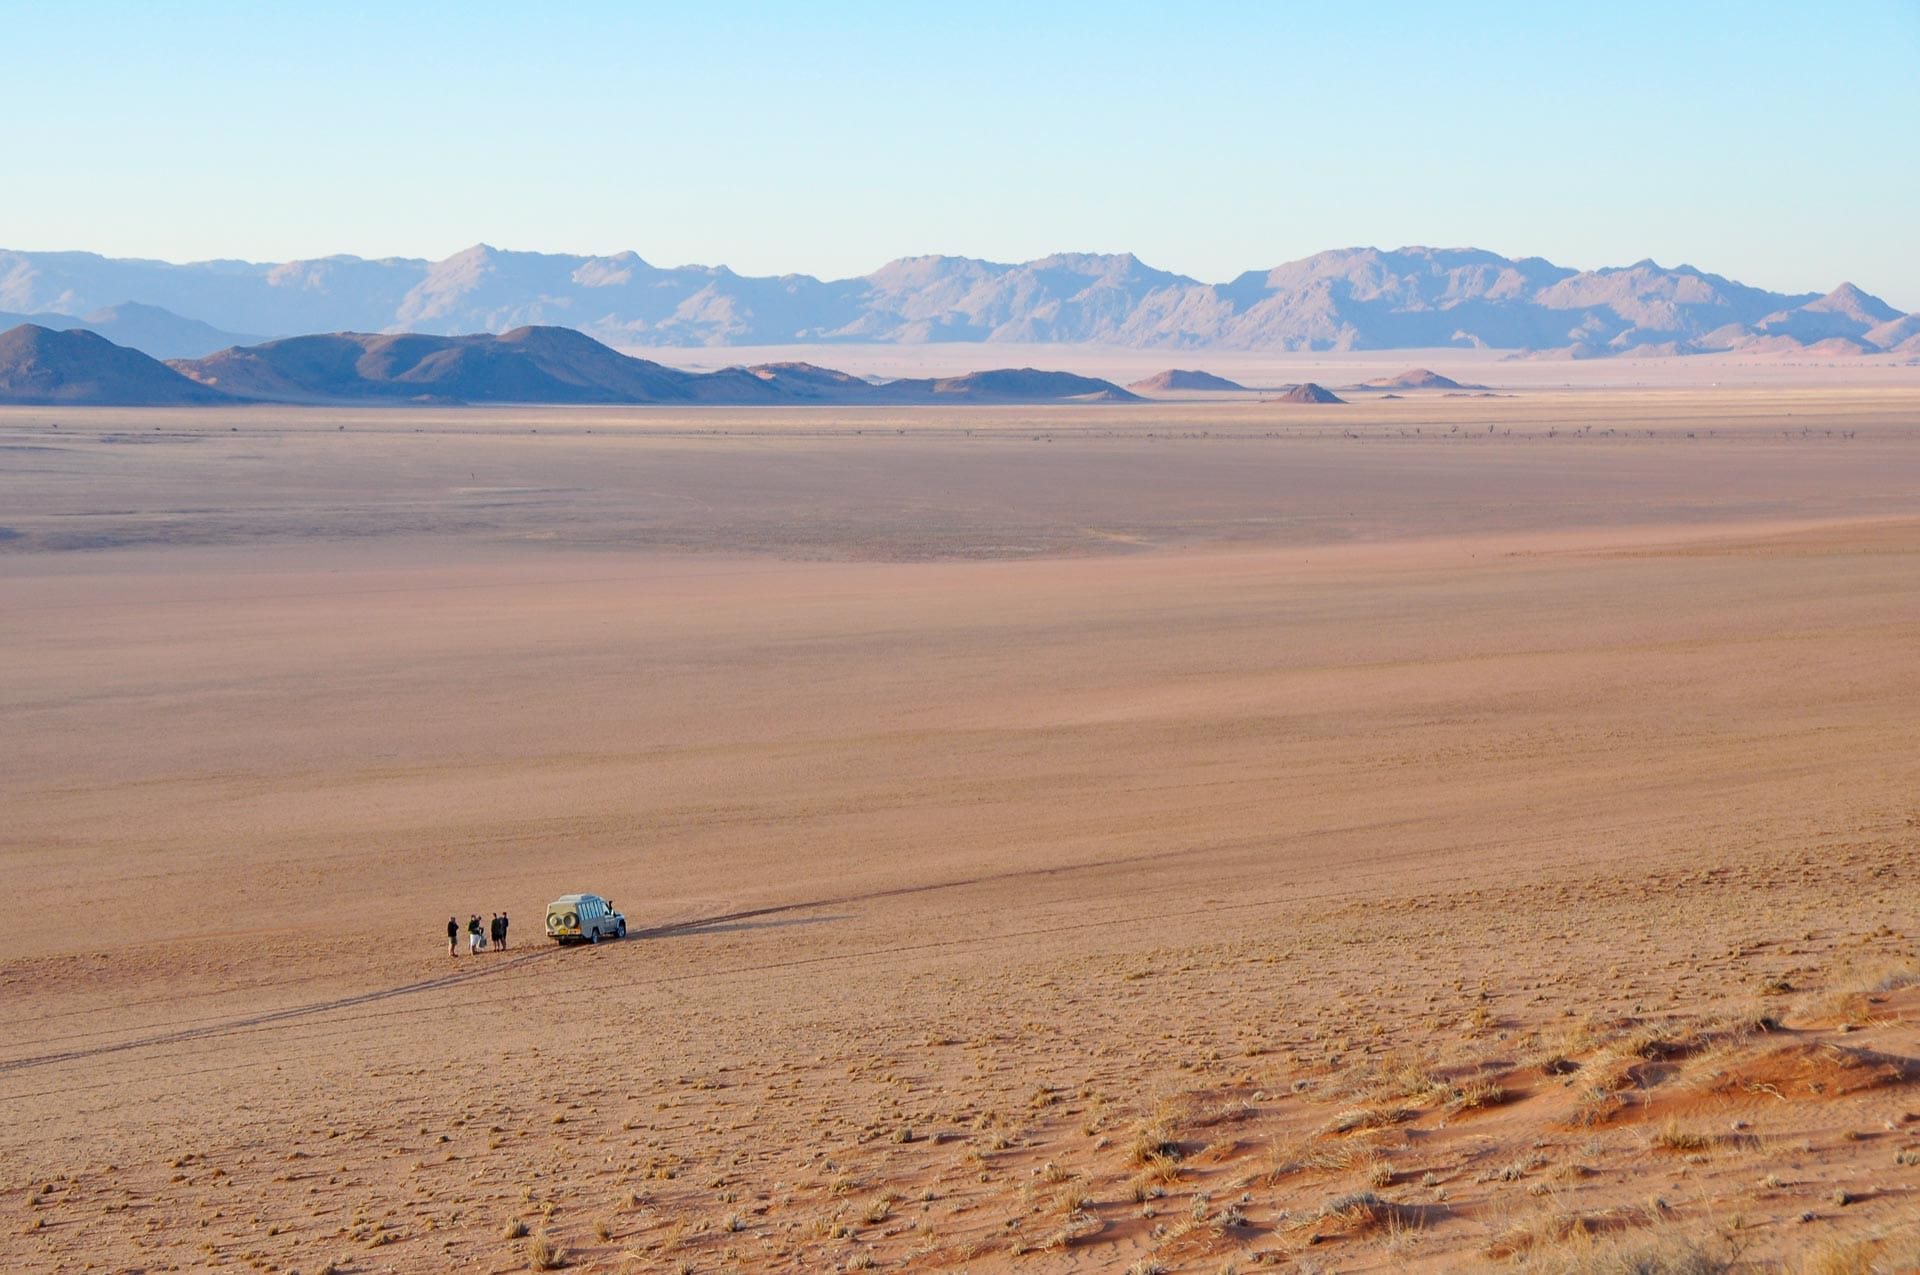 Kanaan-Desert-Retreat-Namibia-Globetrotter-Select-38